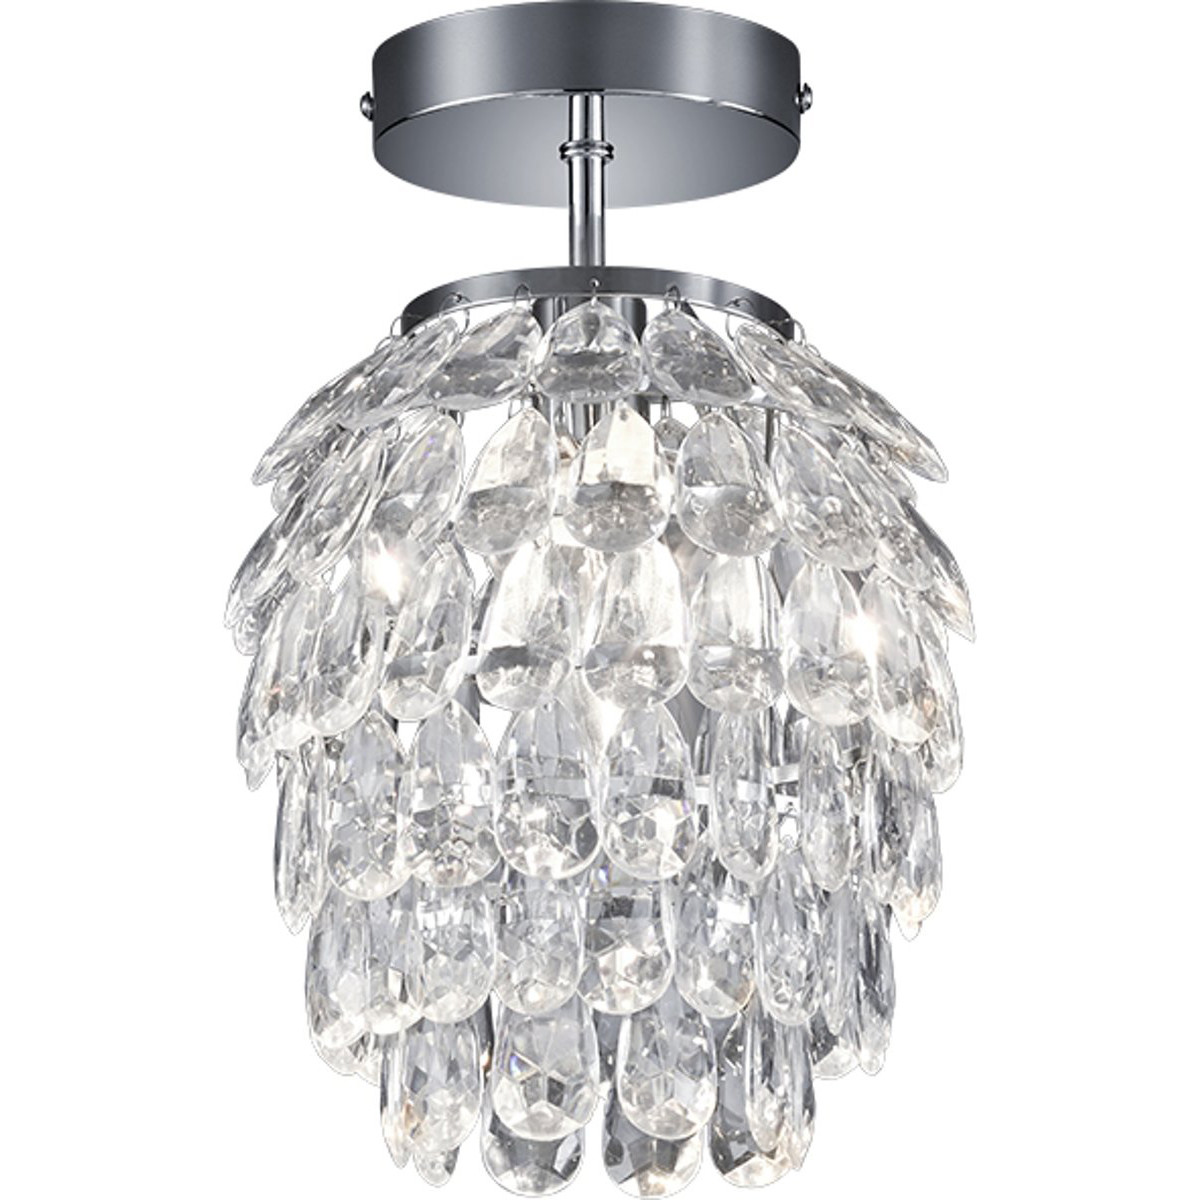 LED Plafondlamp - Plafondverlichting - Trion Pret - E14 Fitting - Rond - Glans Chroom - Aluminium